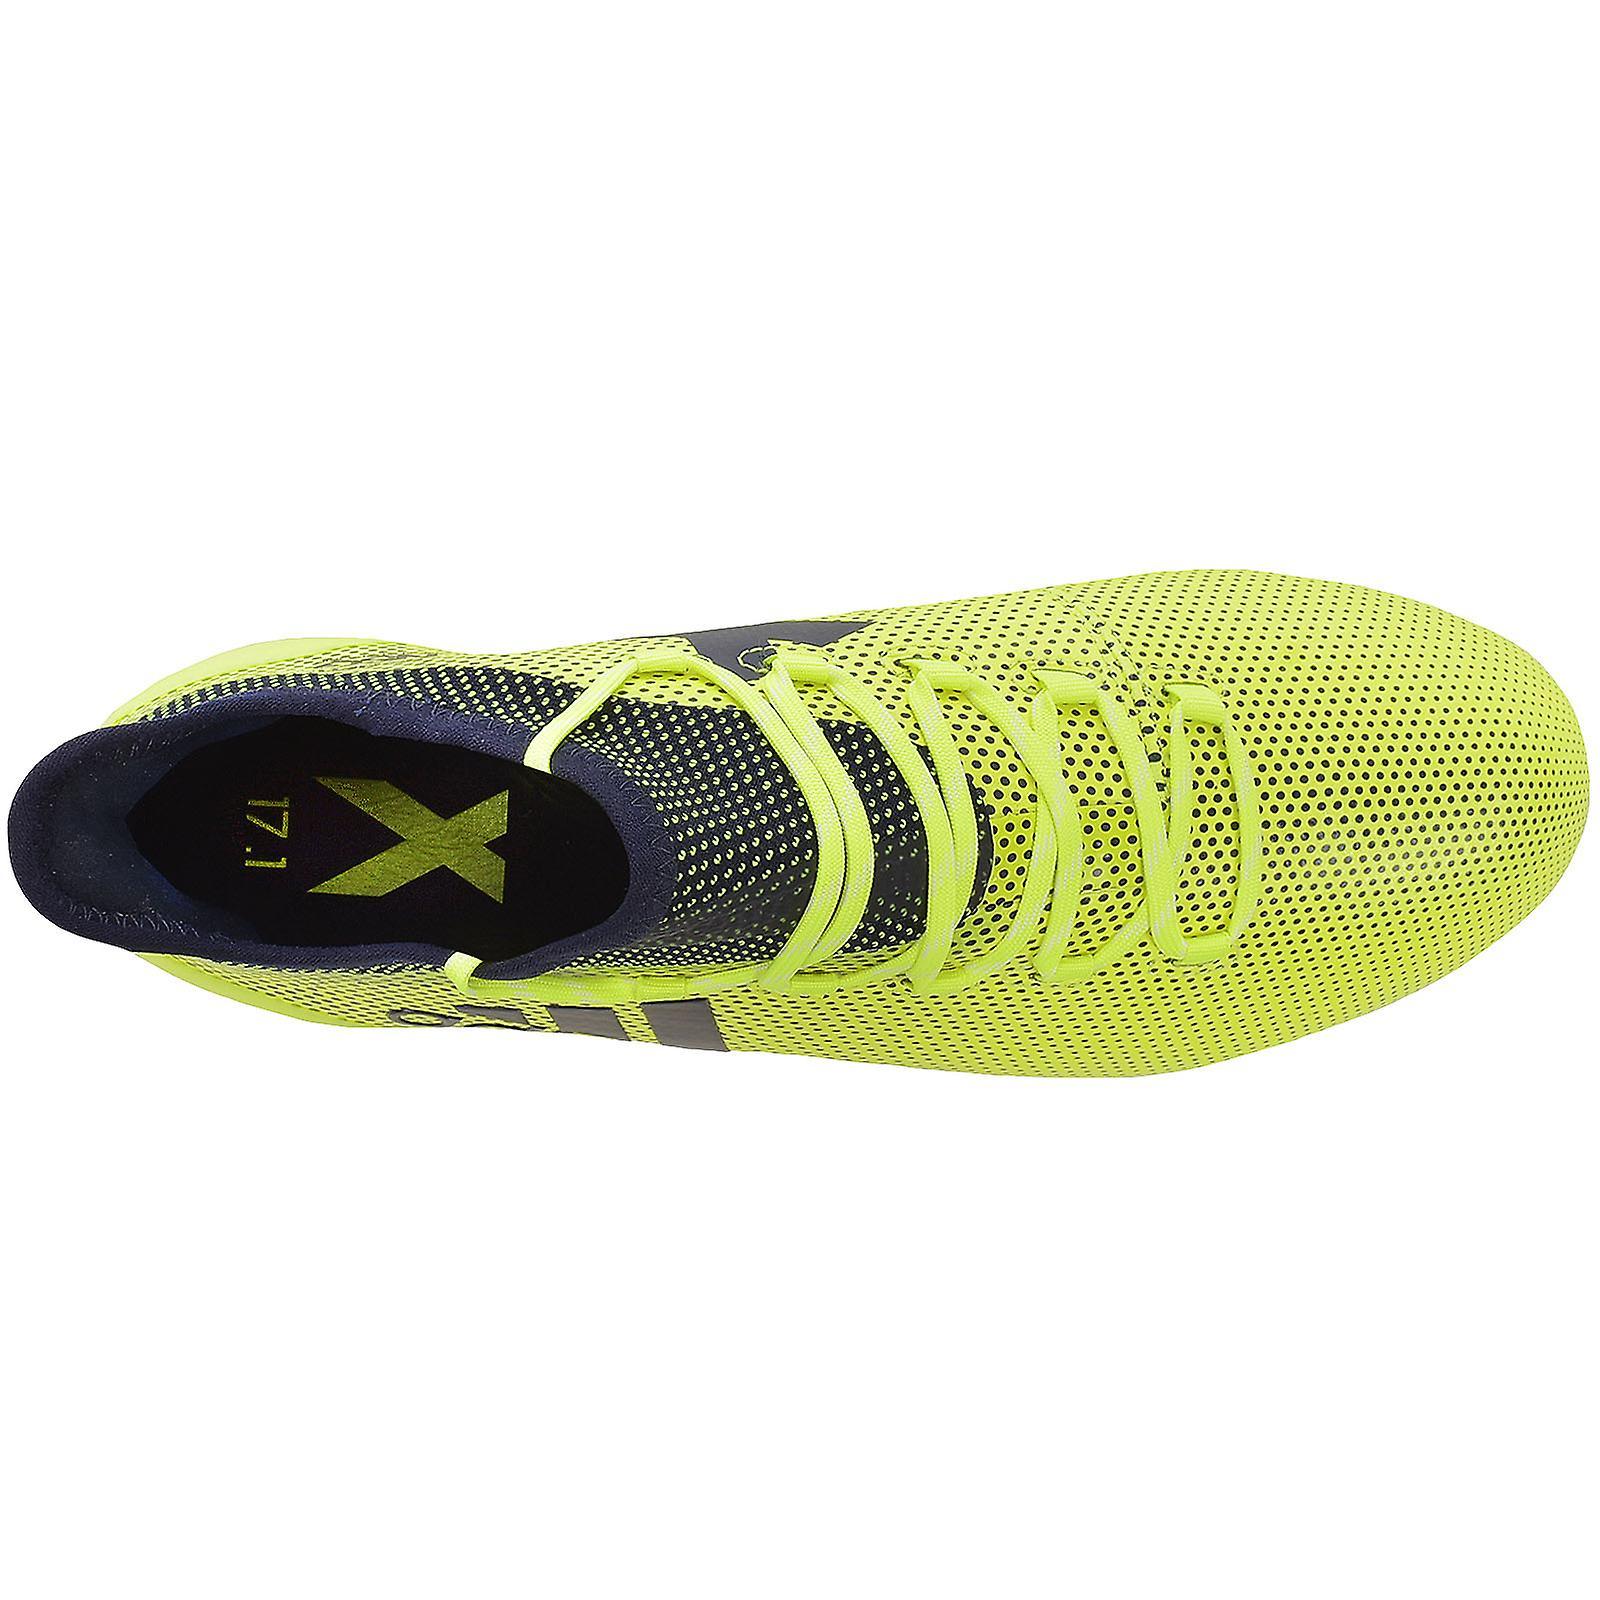 Adidas Performance Mens X 17,1 FG calcio sport stivali scarpe - giallo  SvlpVz